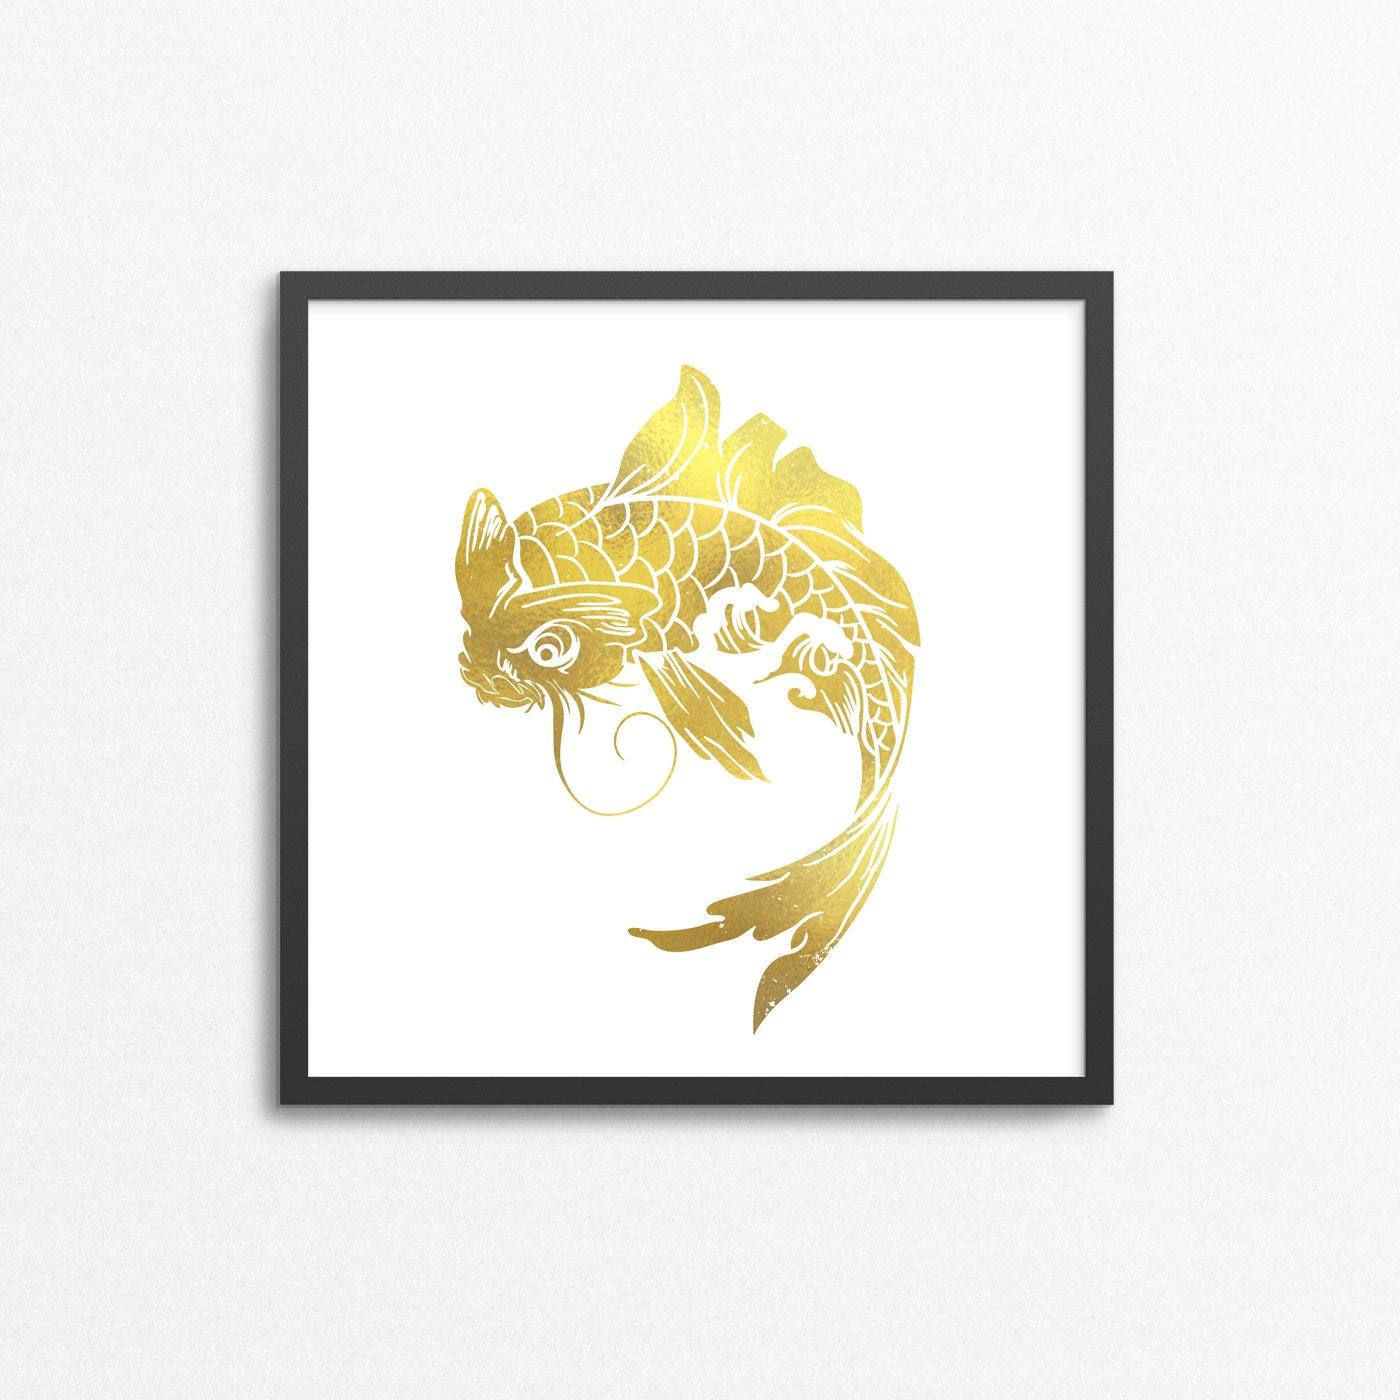 Gold Foil Koi Fish Print Japanese Art Tattoo Stamp No | Etsy